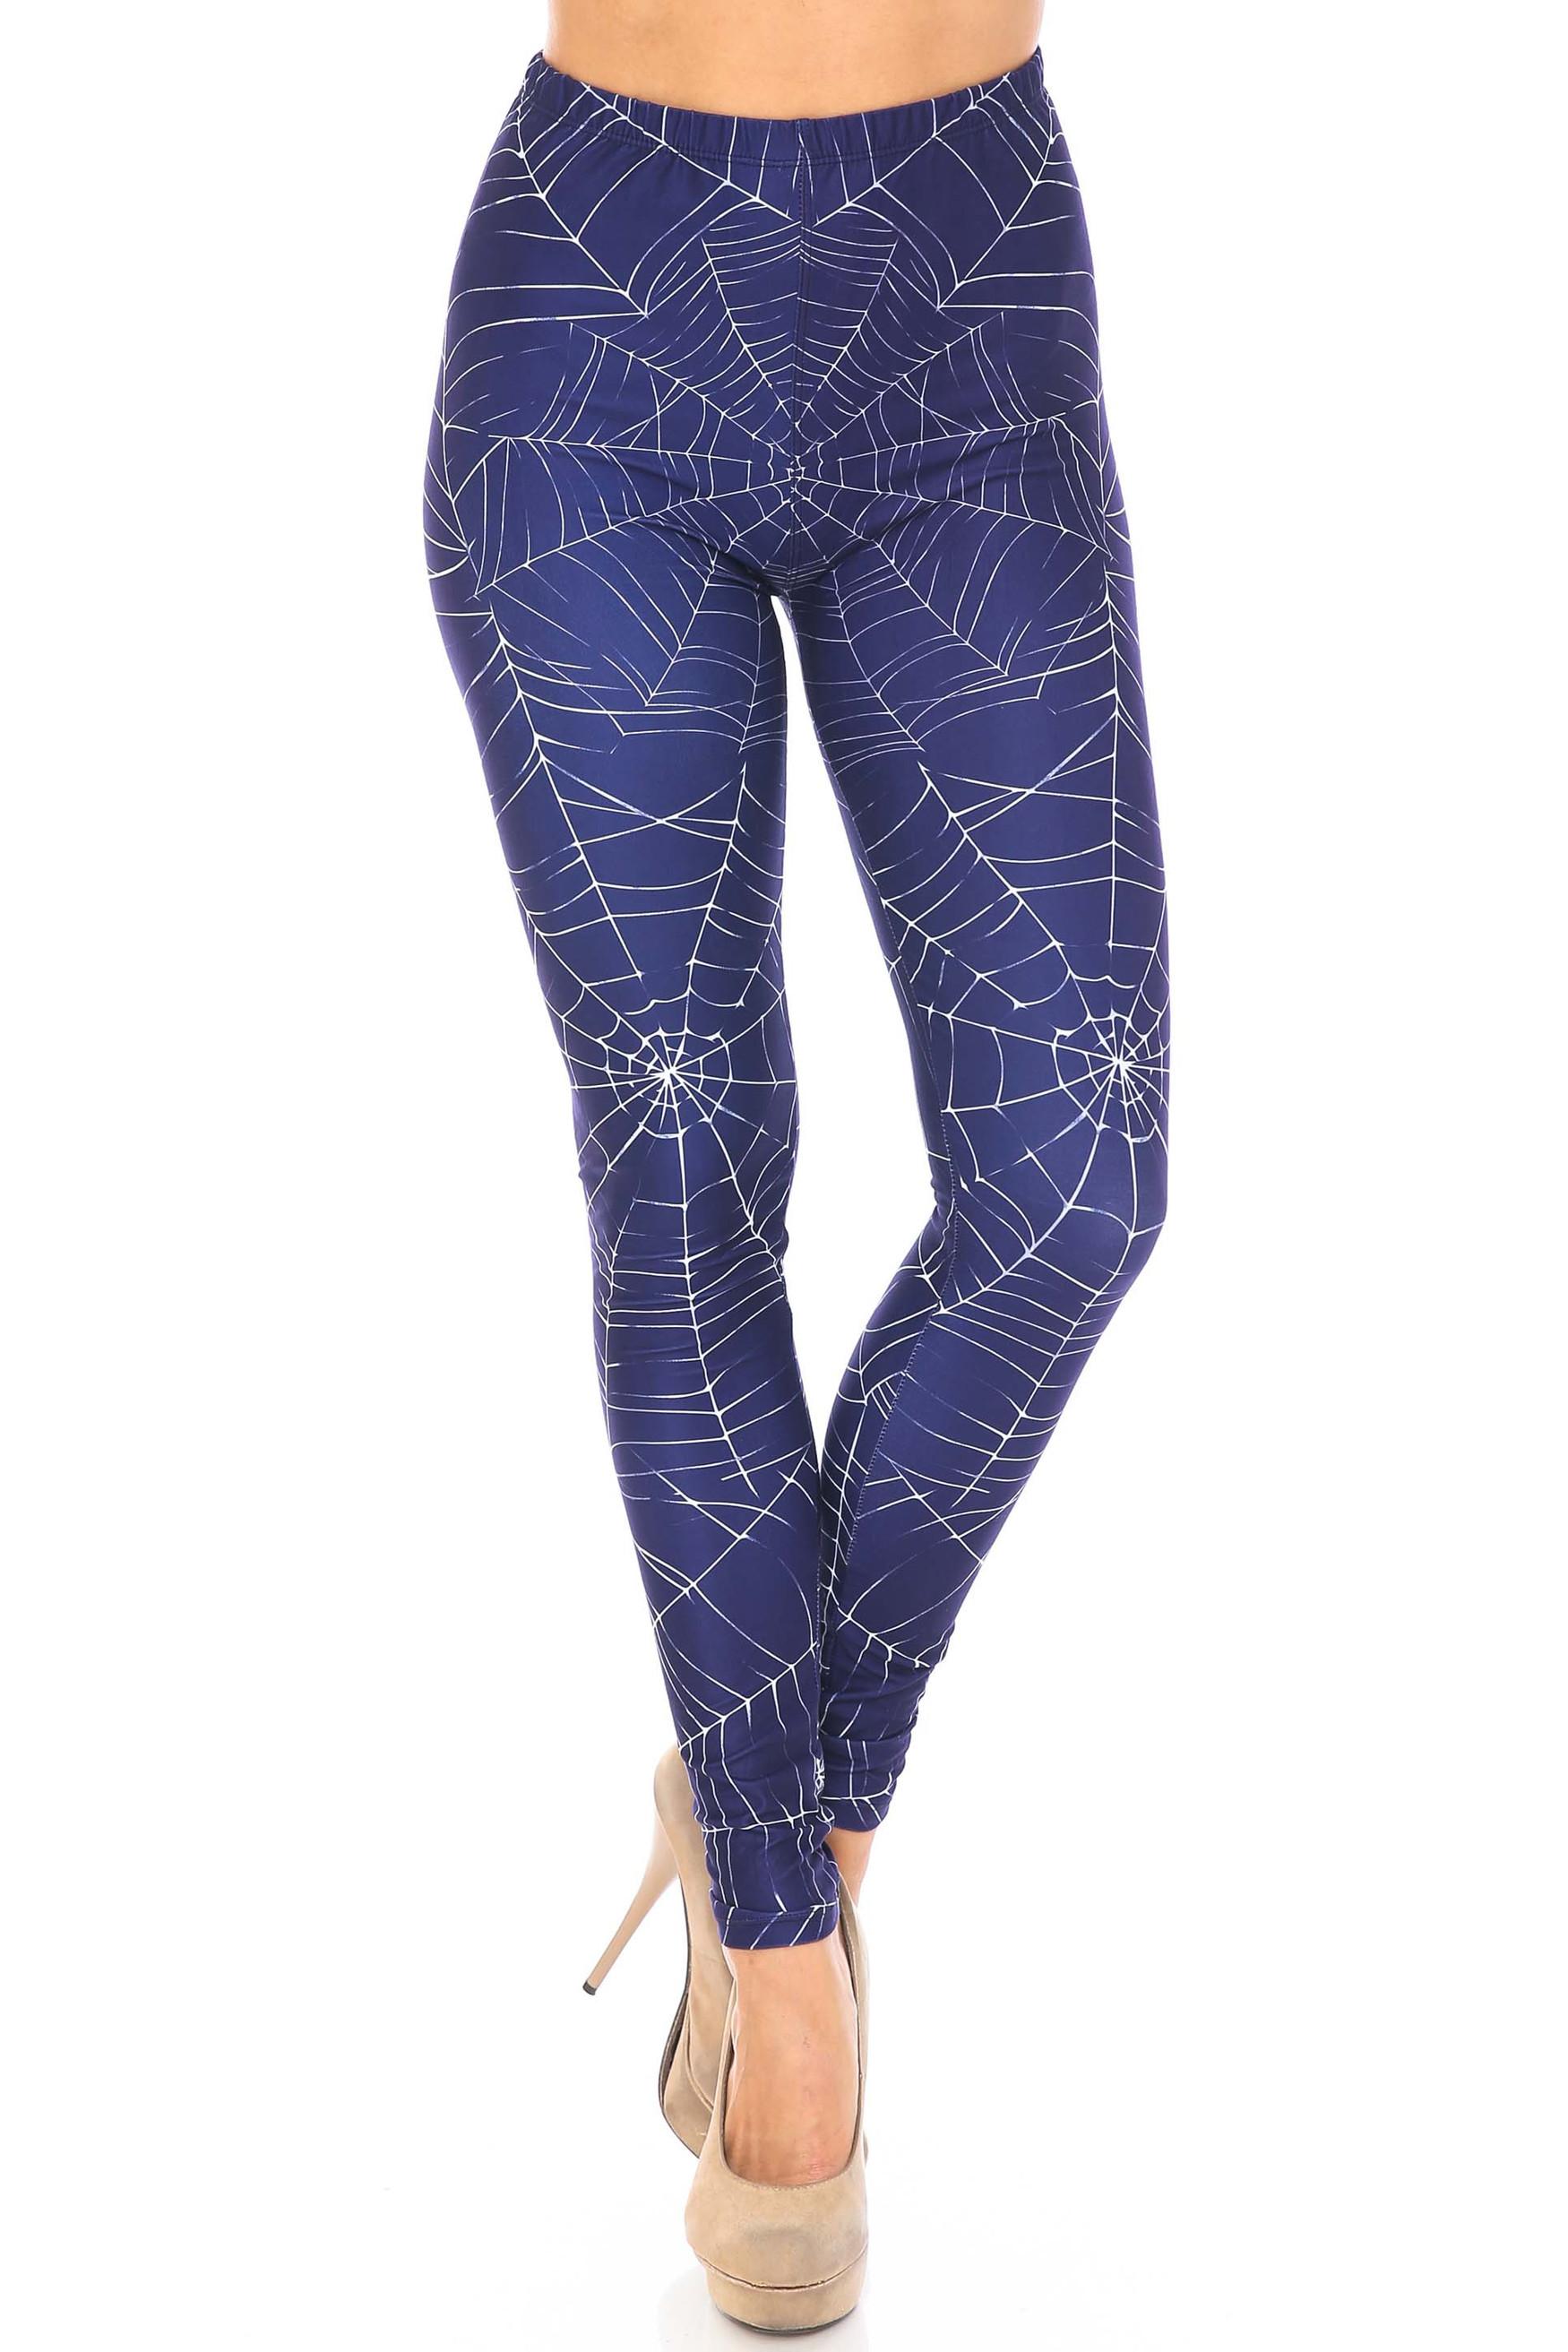 Creamy Soft Spiderwebs Halloween Plus Size Leggings - By USA Fashion™